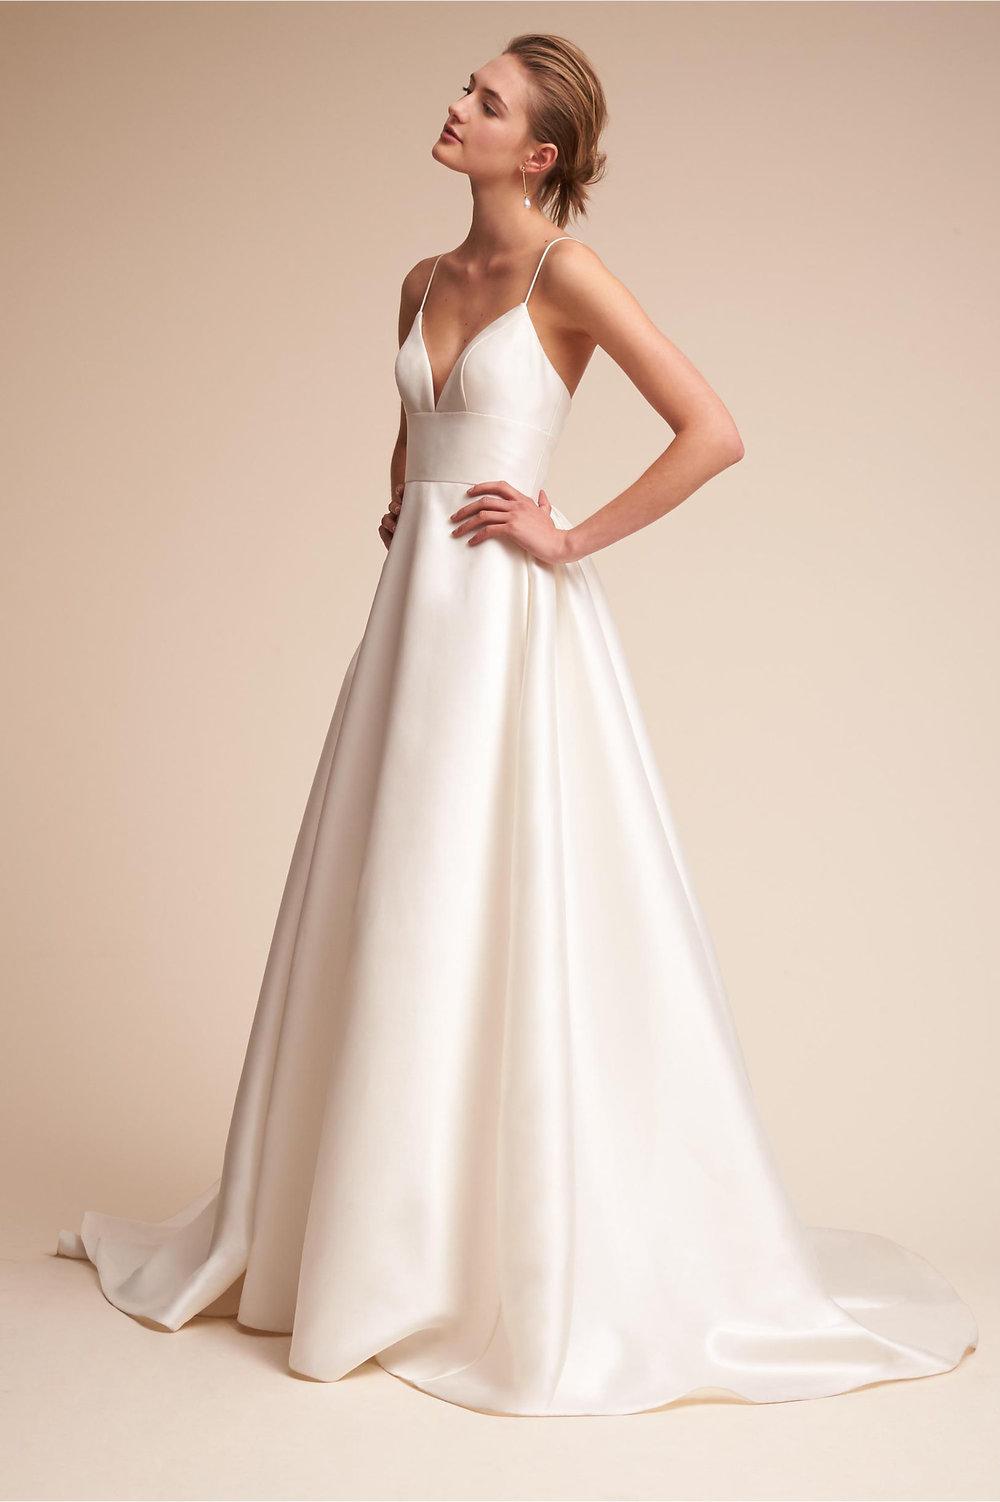 opaline gown - $1,450.00